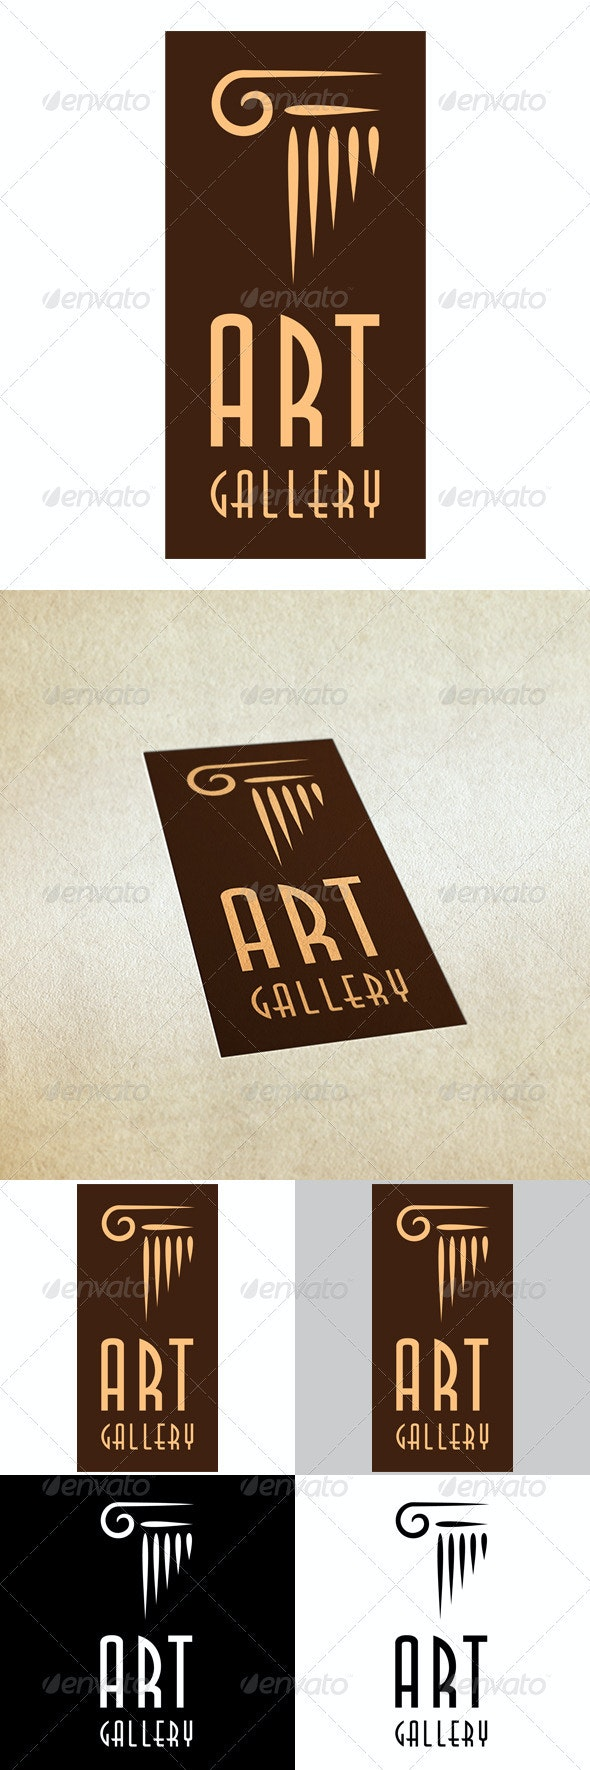 Art Gallery - Vector Abstract